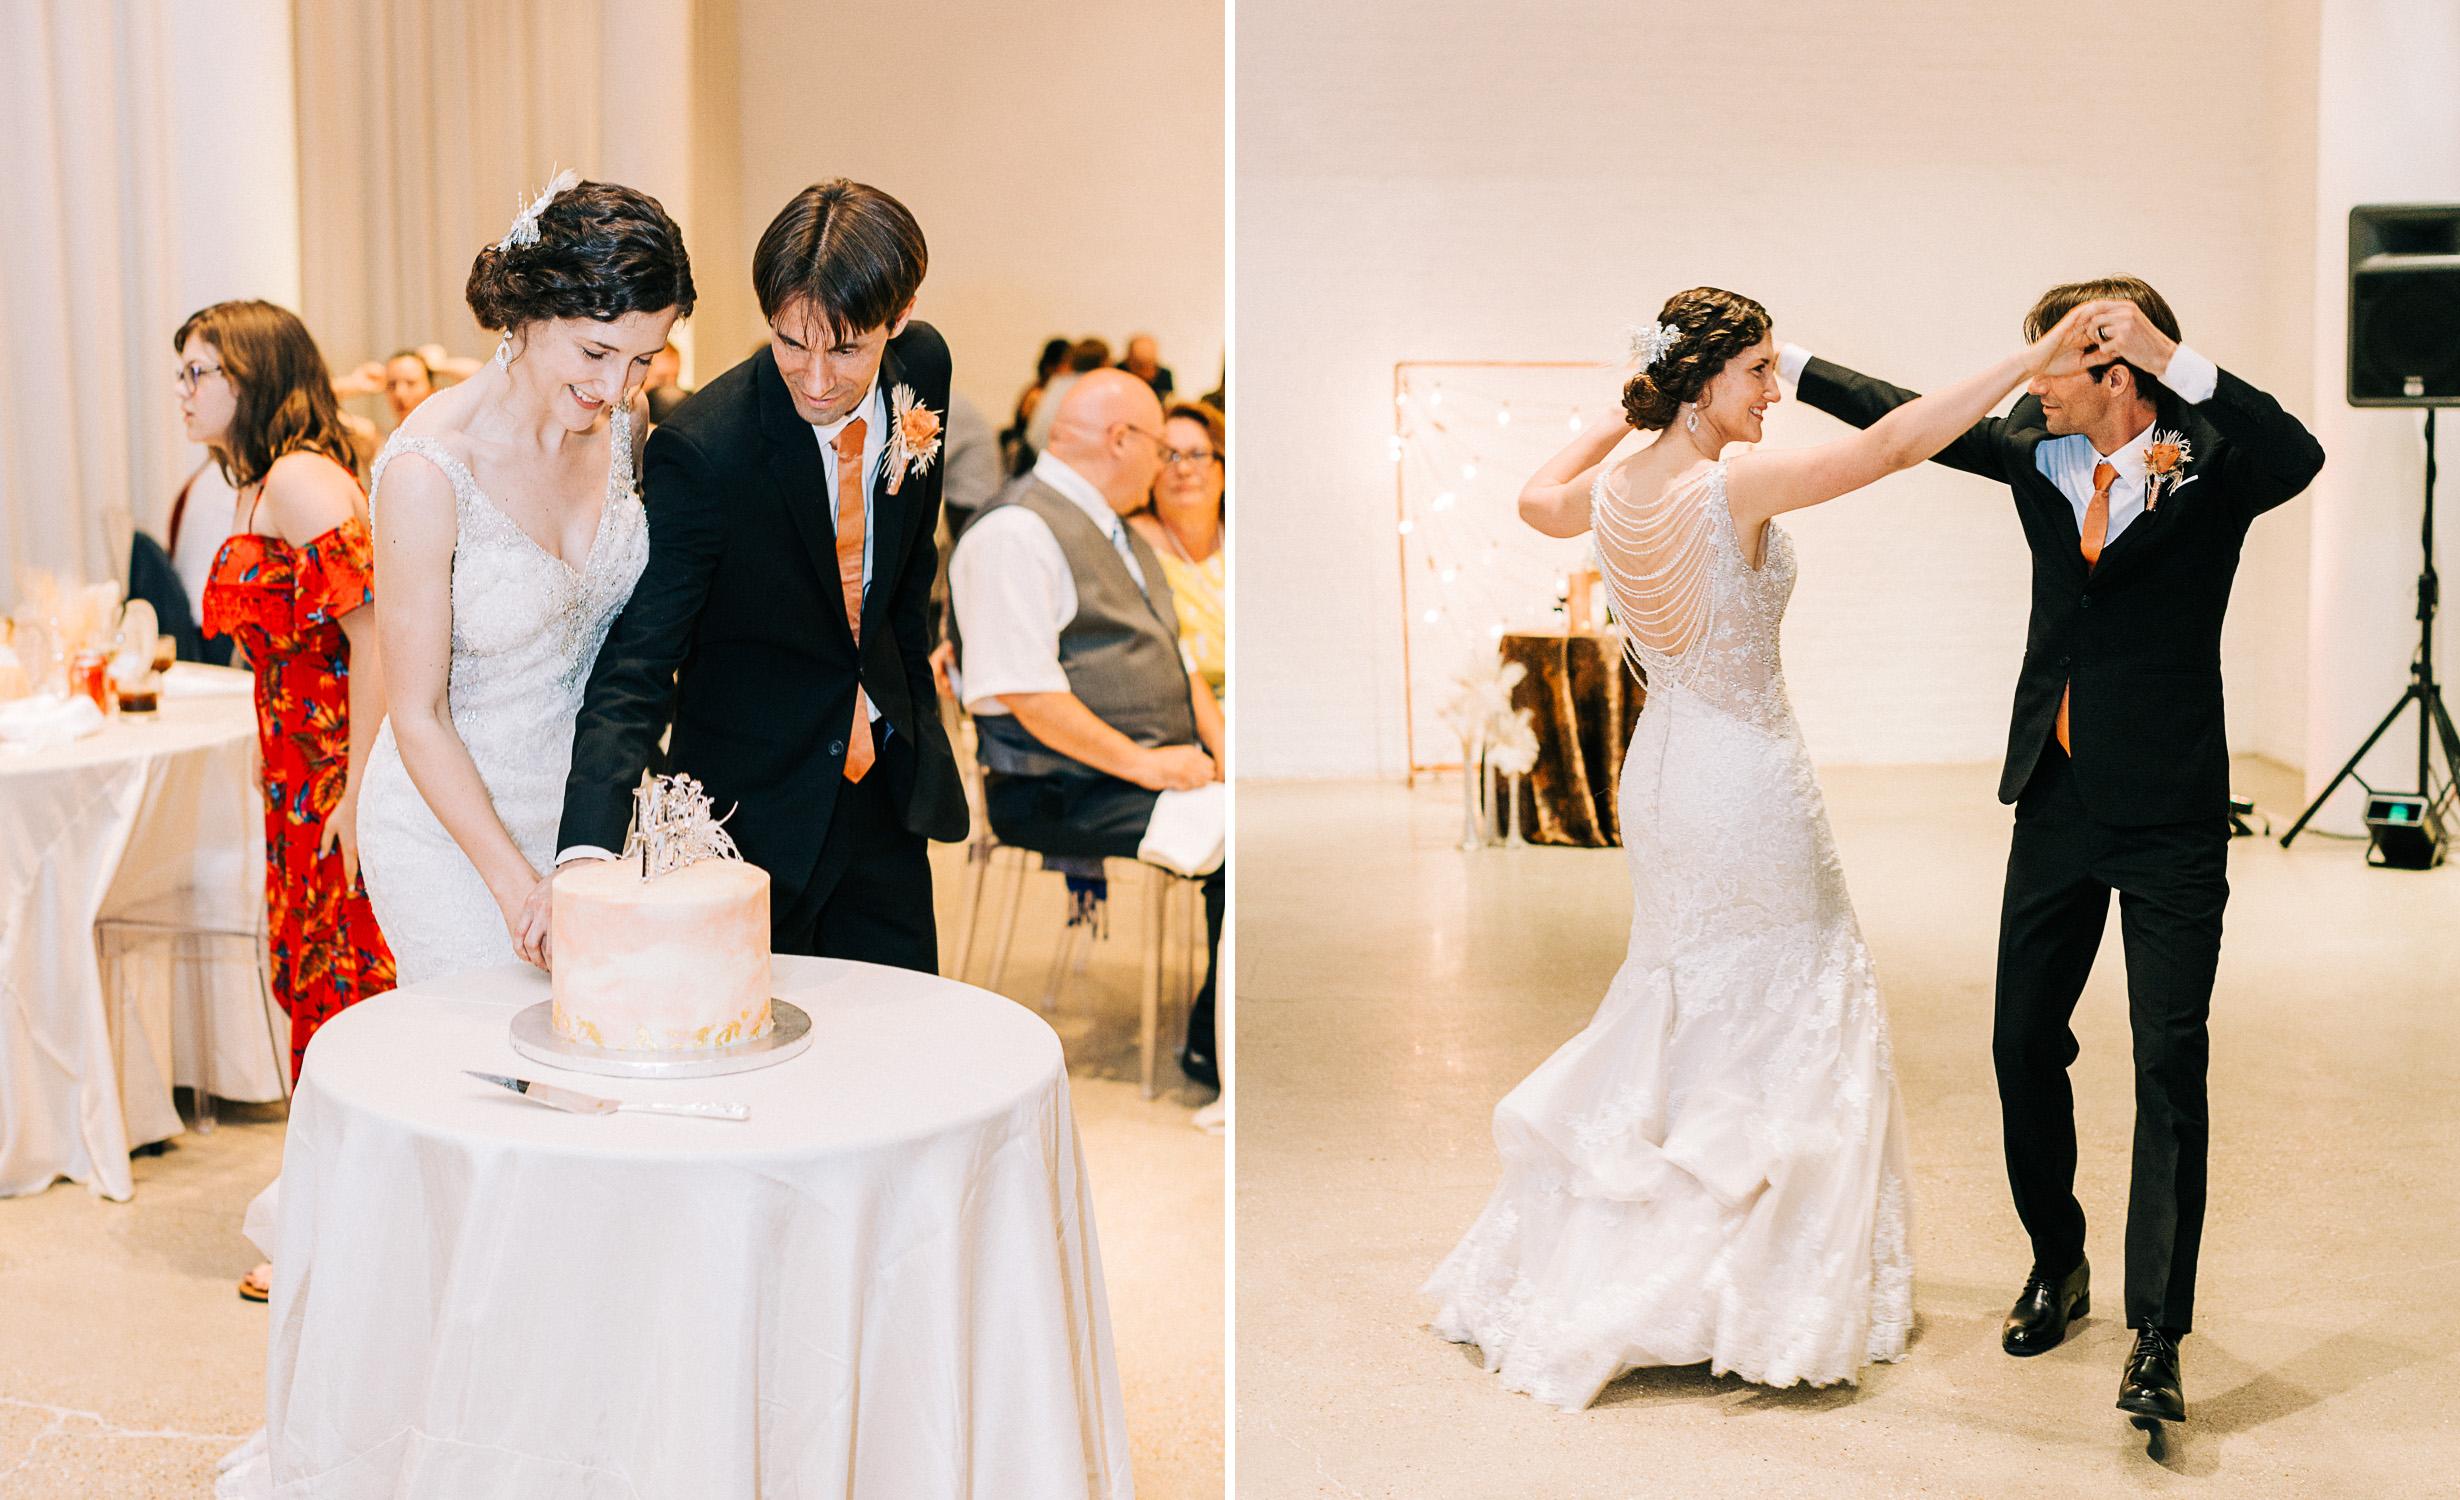 Dorothy_Louise_Photography_University_of_Chicago_Wedding20.jpg